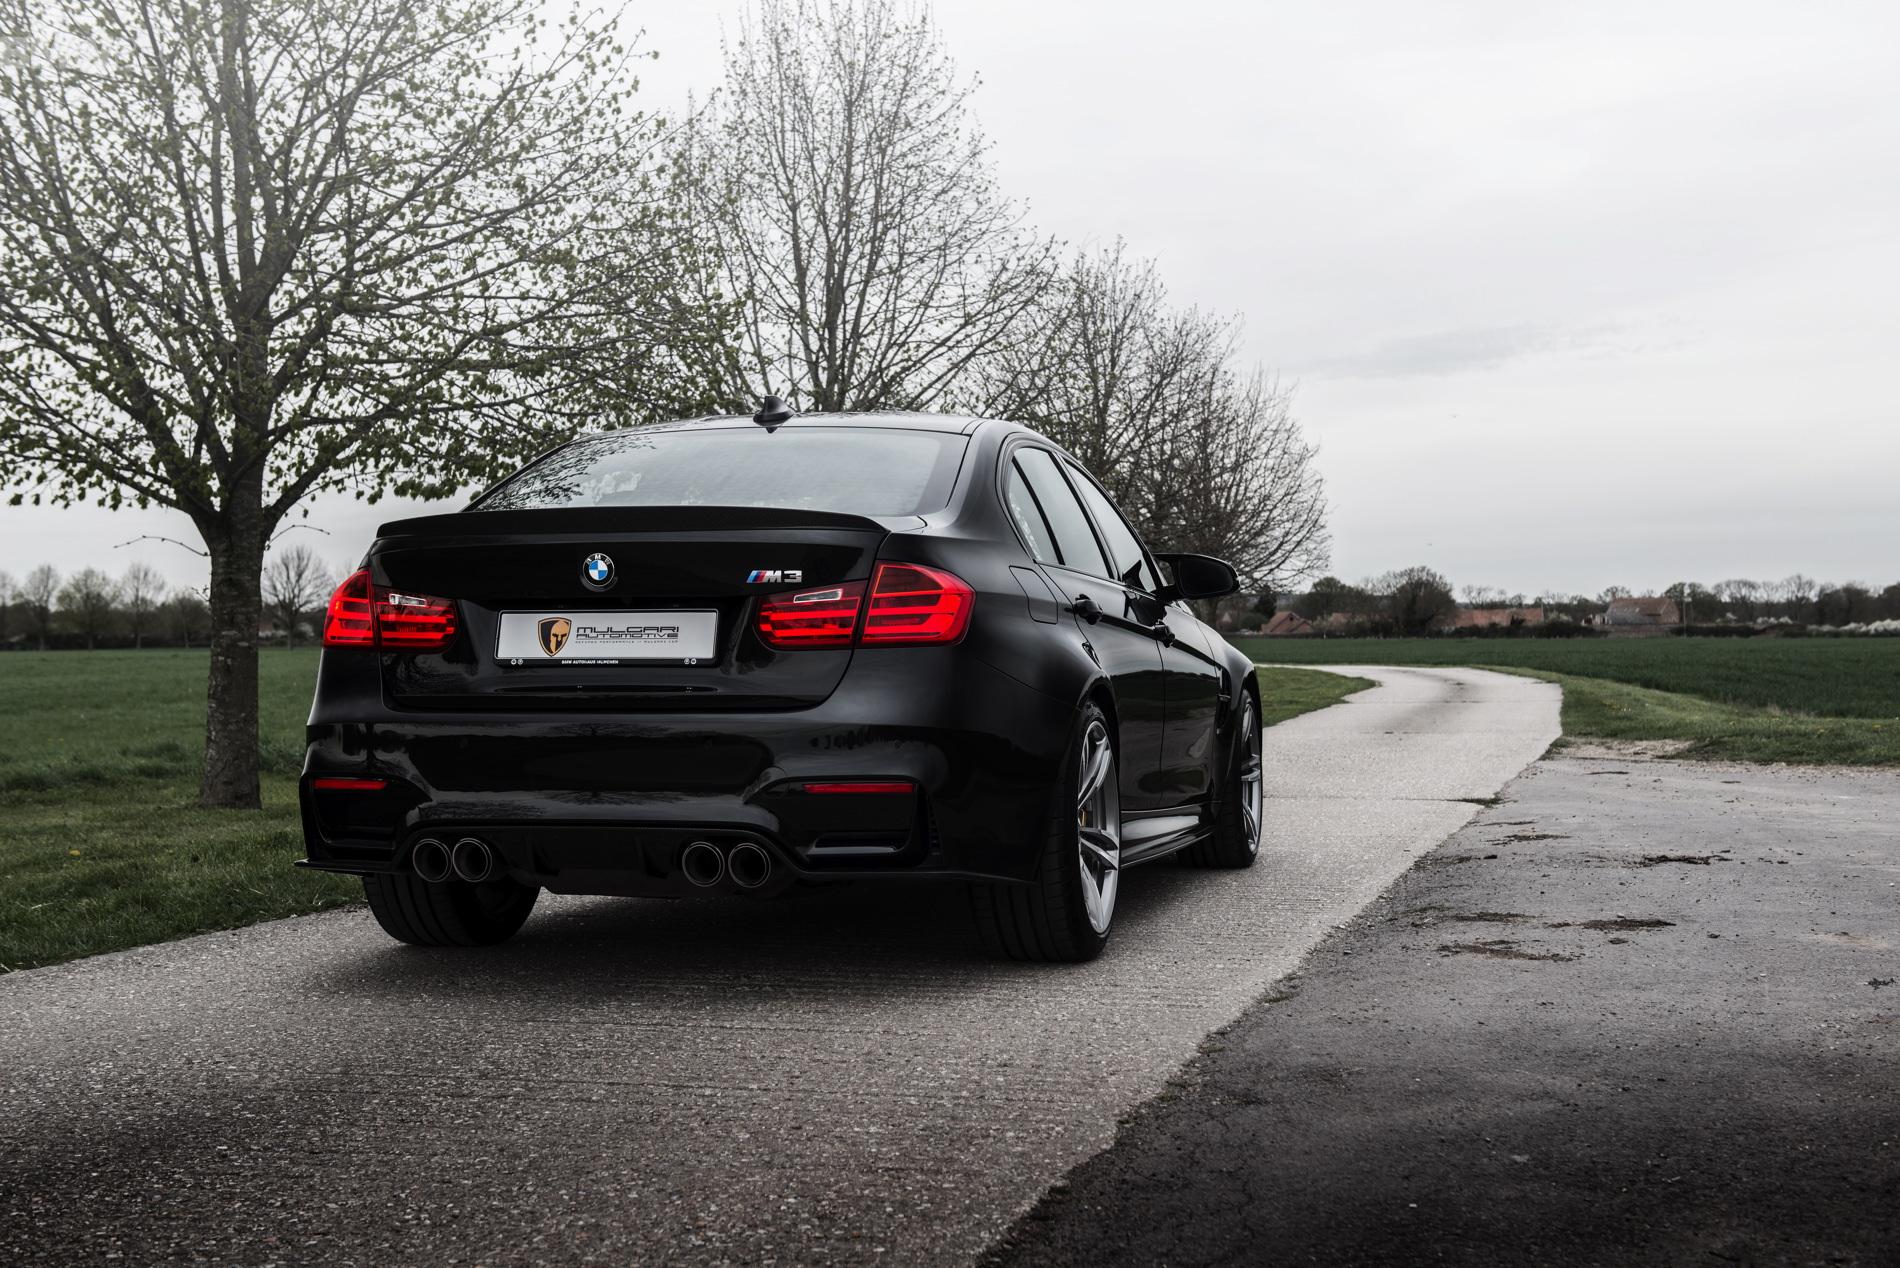 Sapphire Black Bmw M3 Gets Tuned By Mulgari Automotive